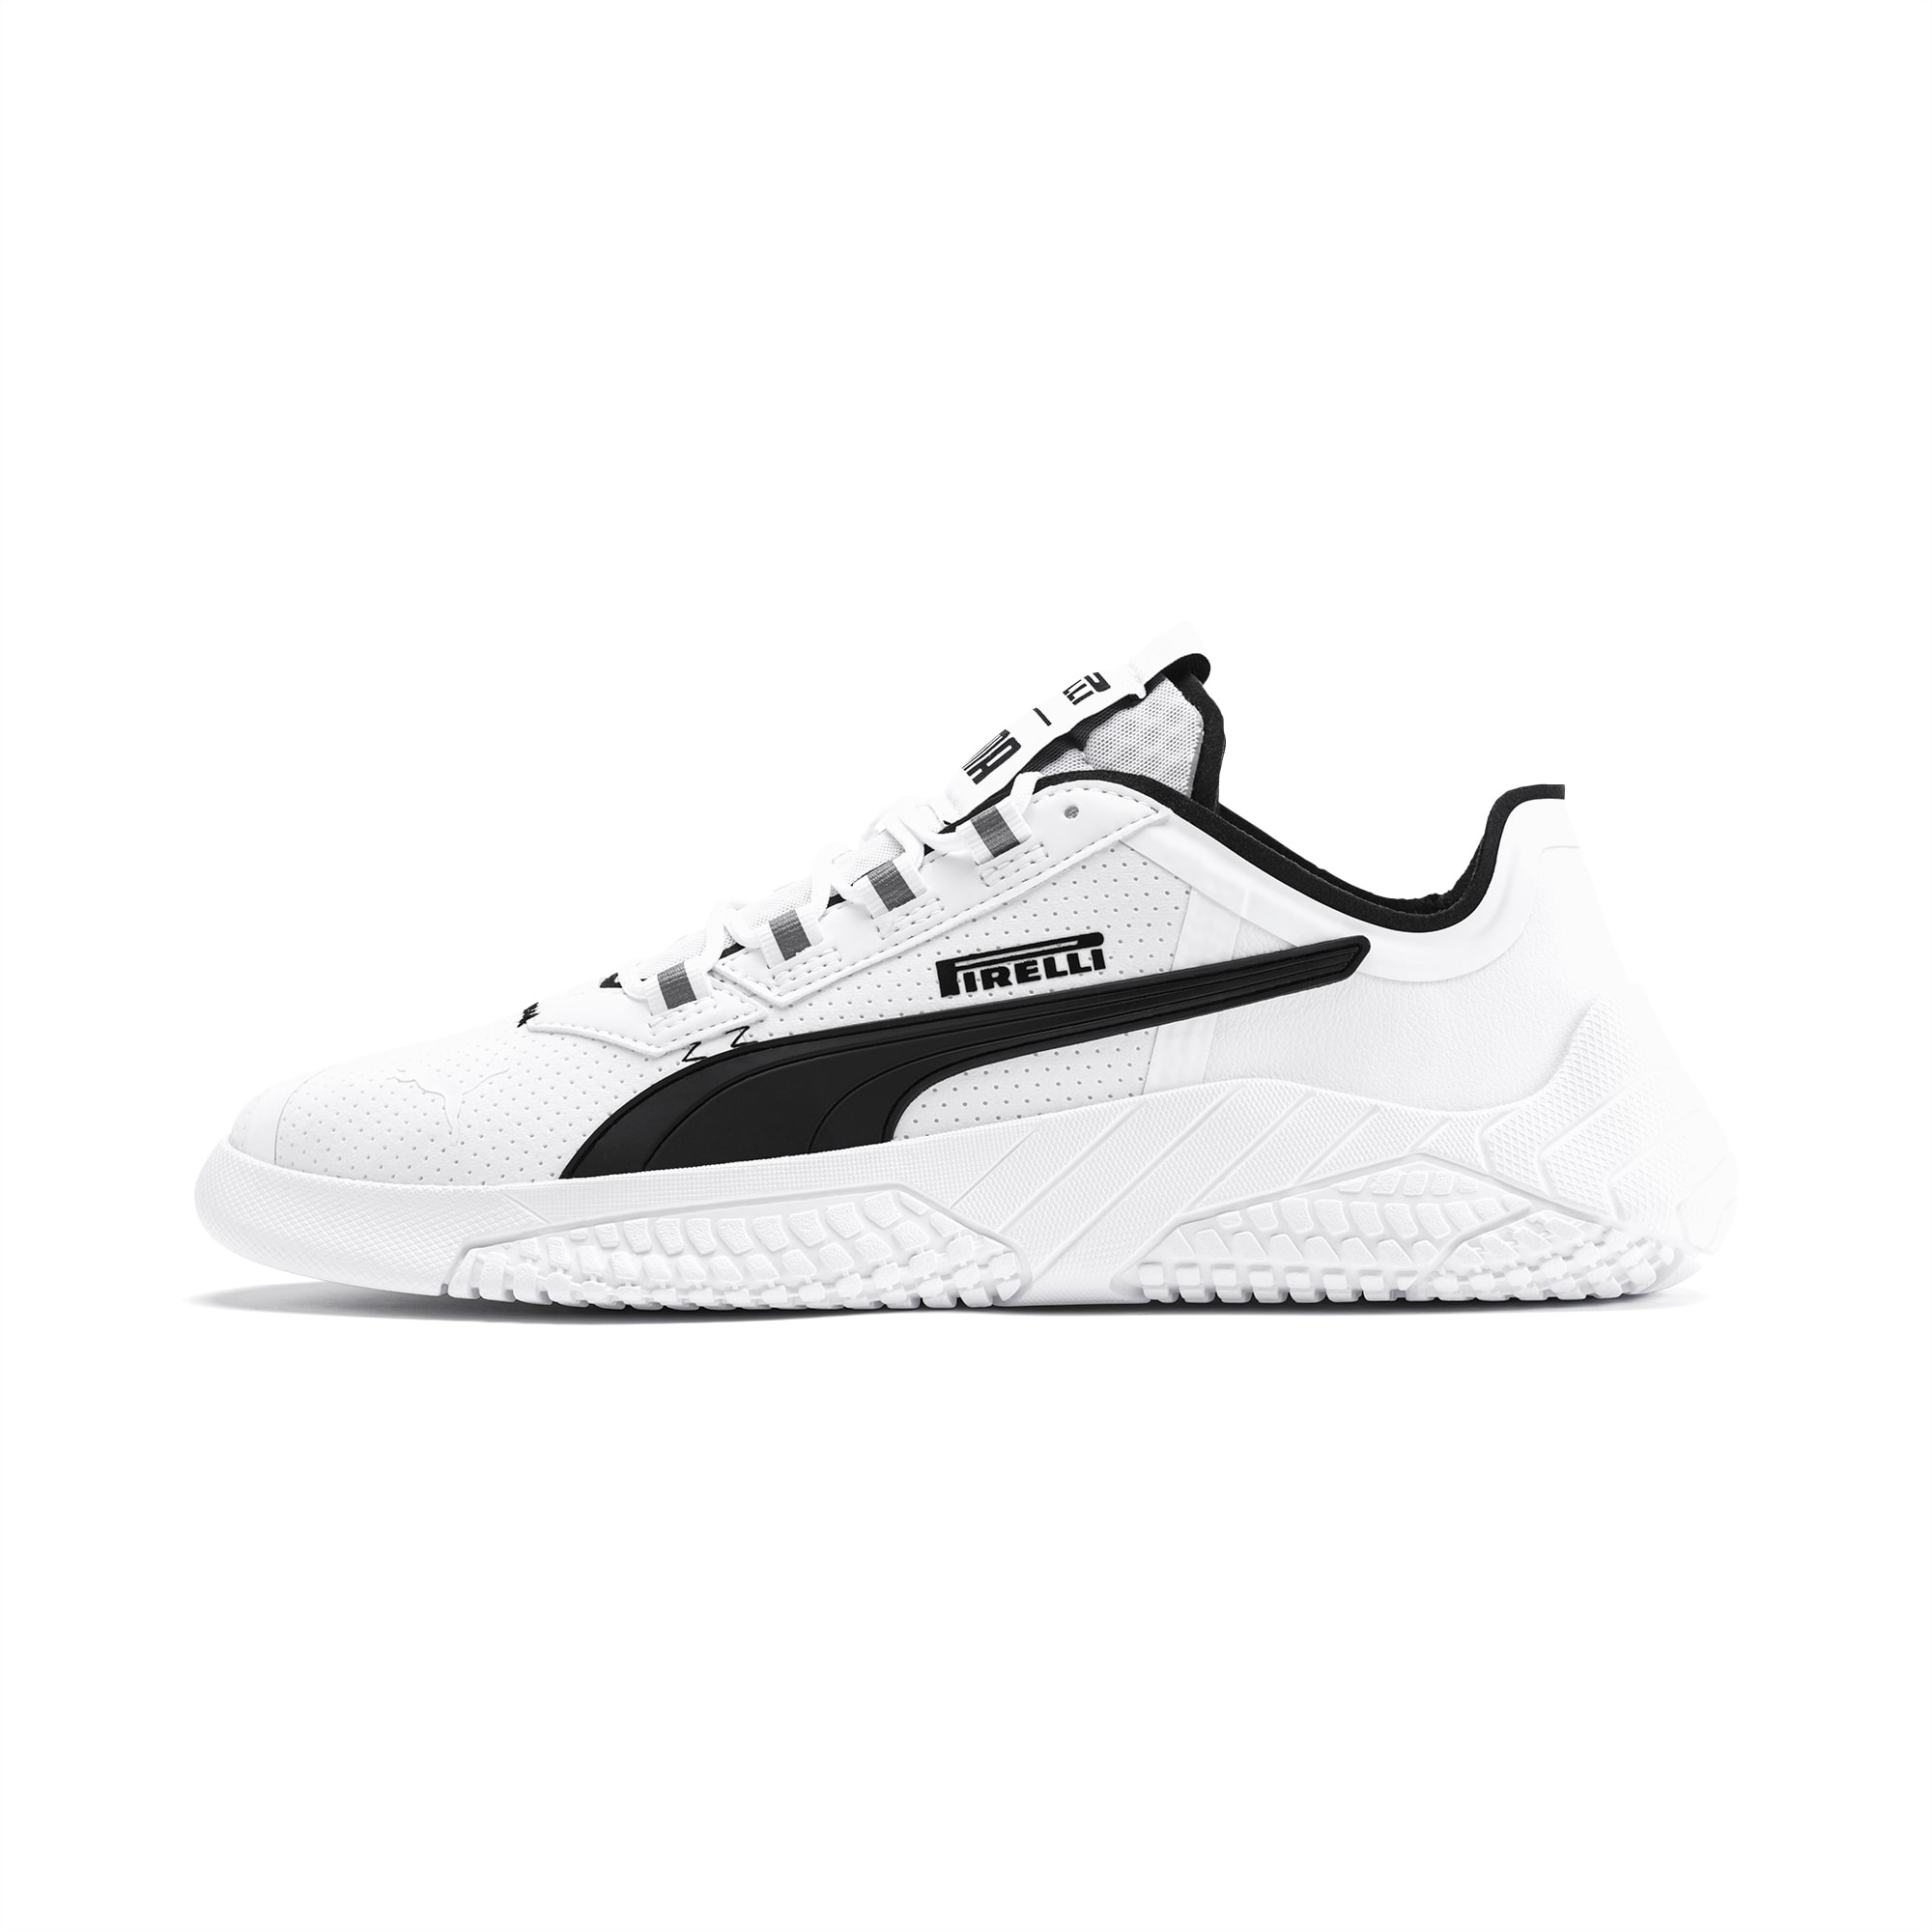 Replicat X Pirelli Motorsport Shoes